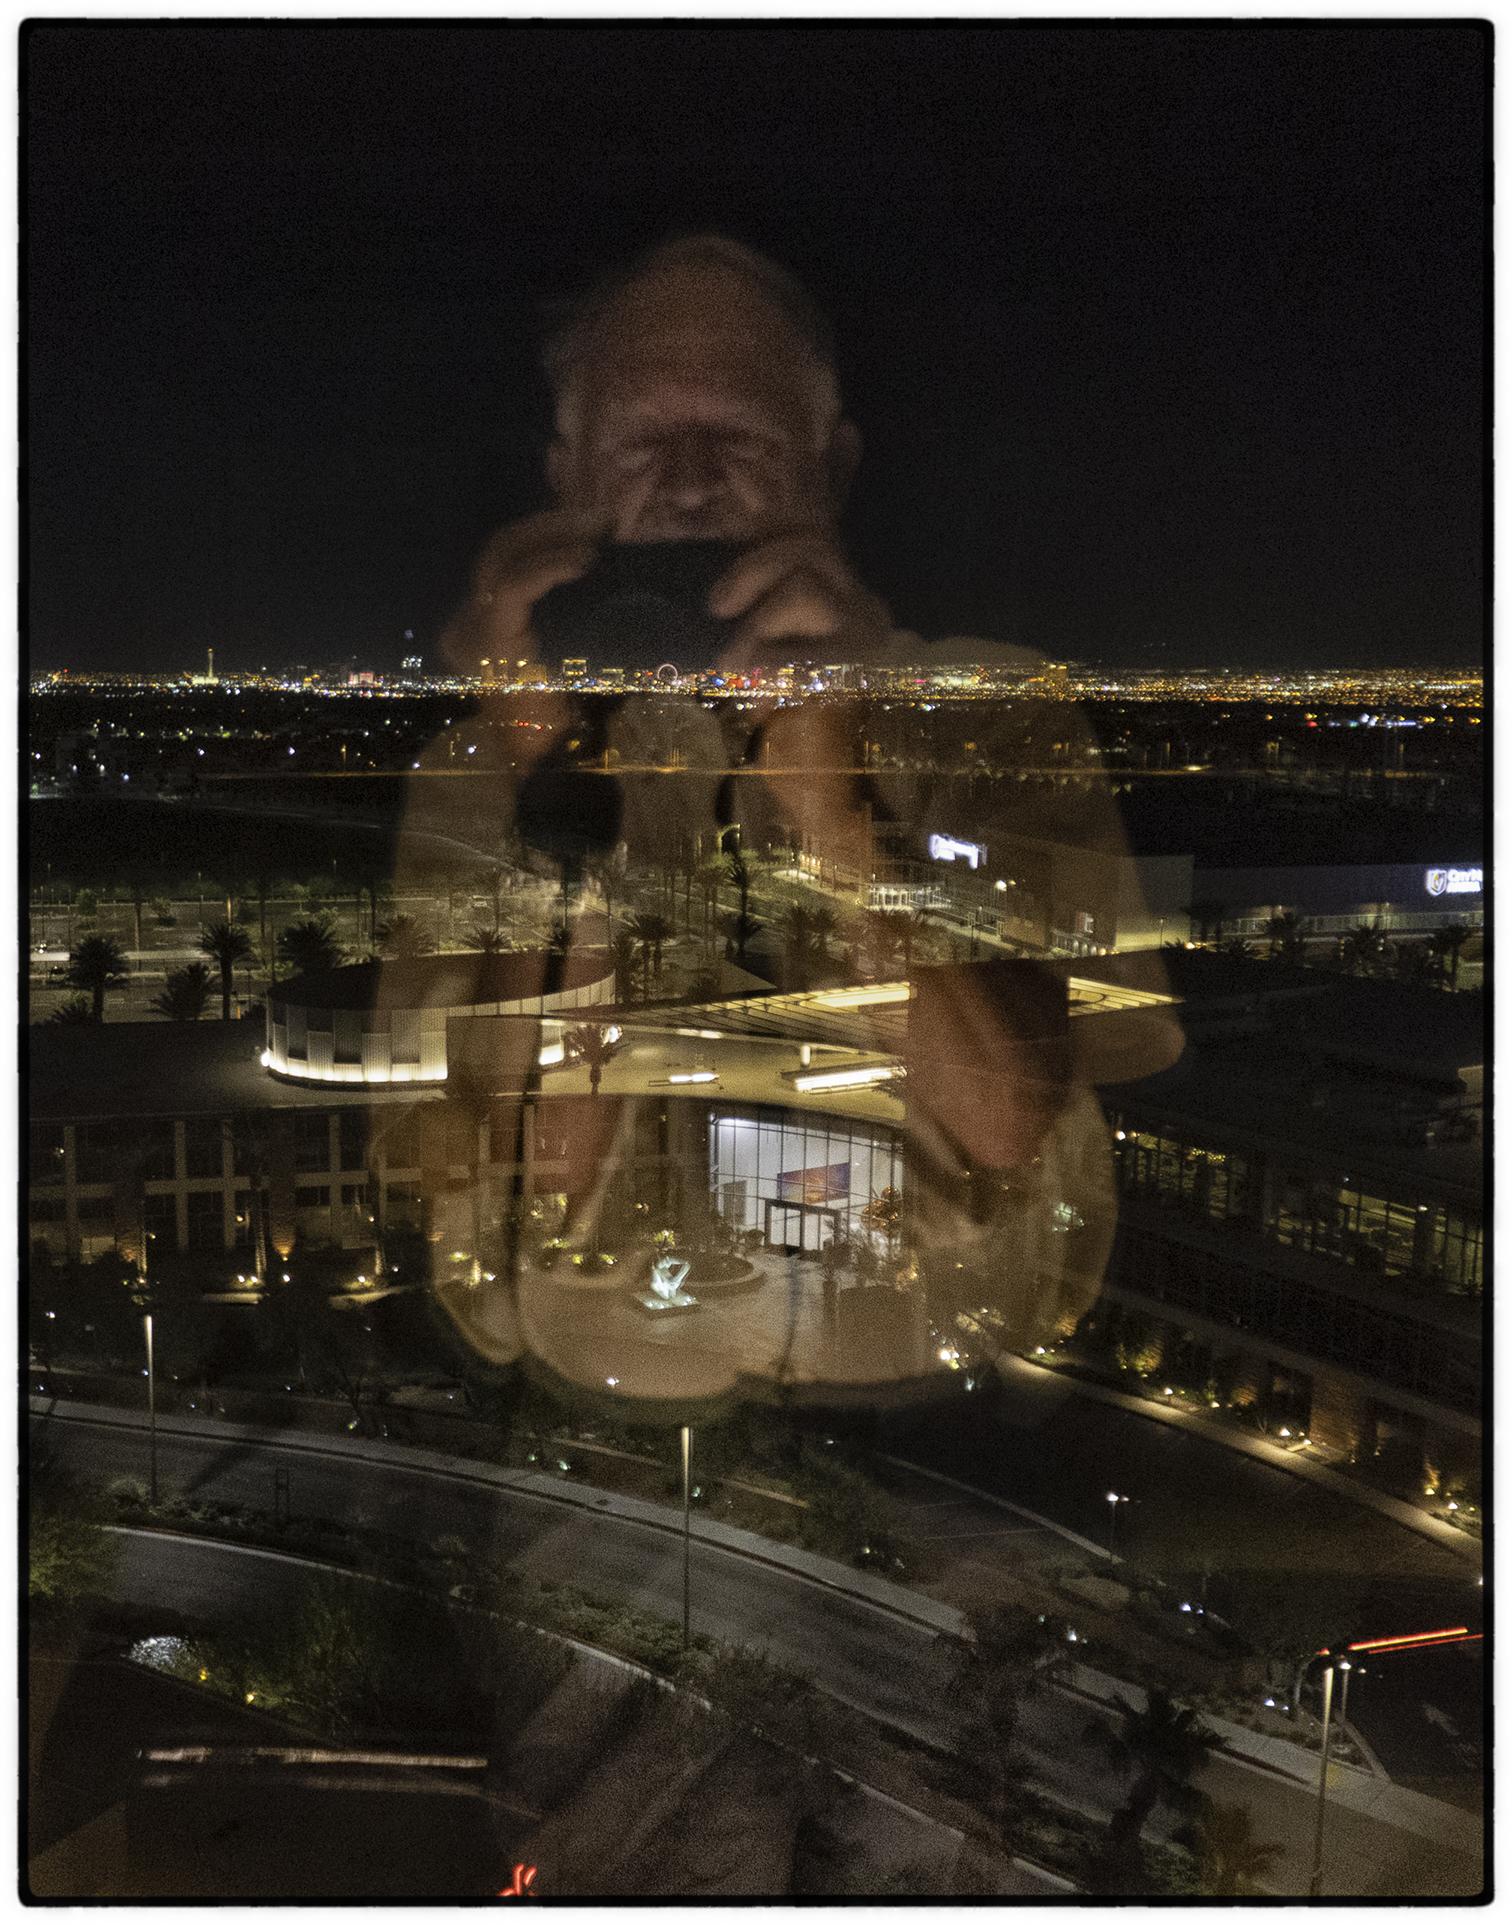 Selfie, Red Rock Casino, Las Vegas